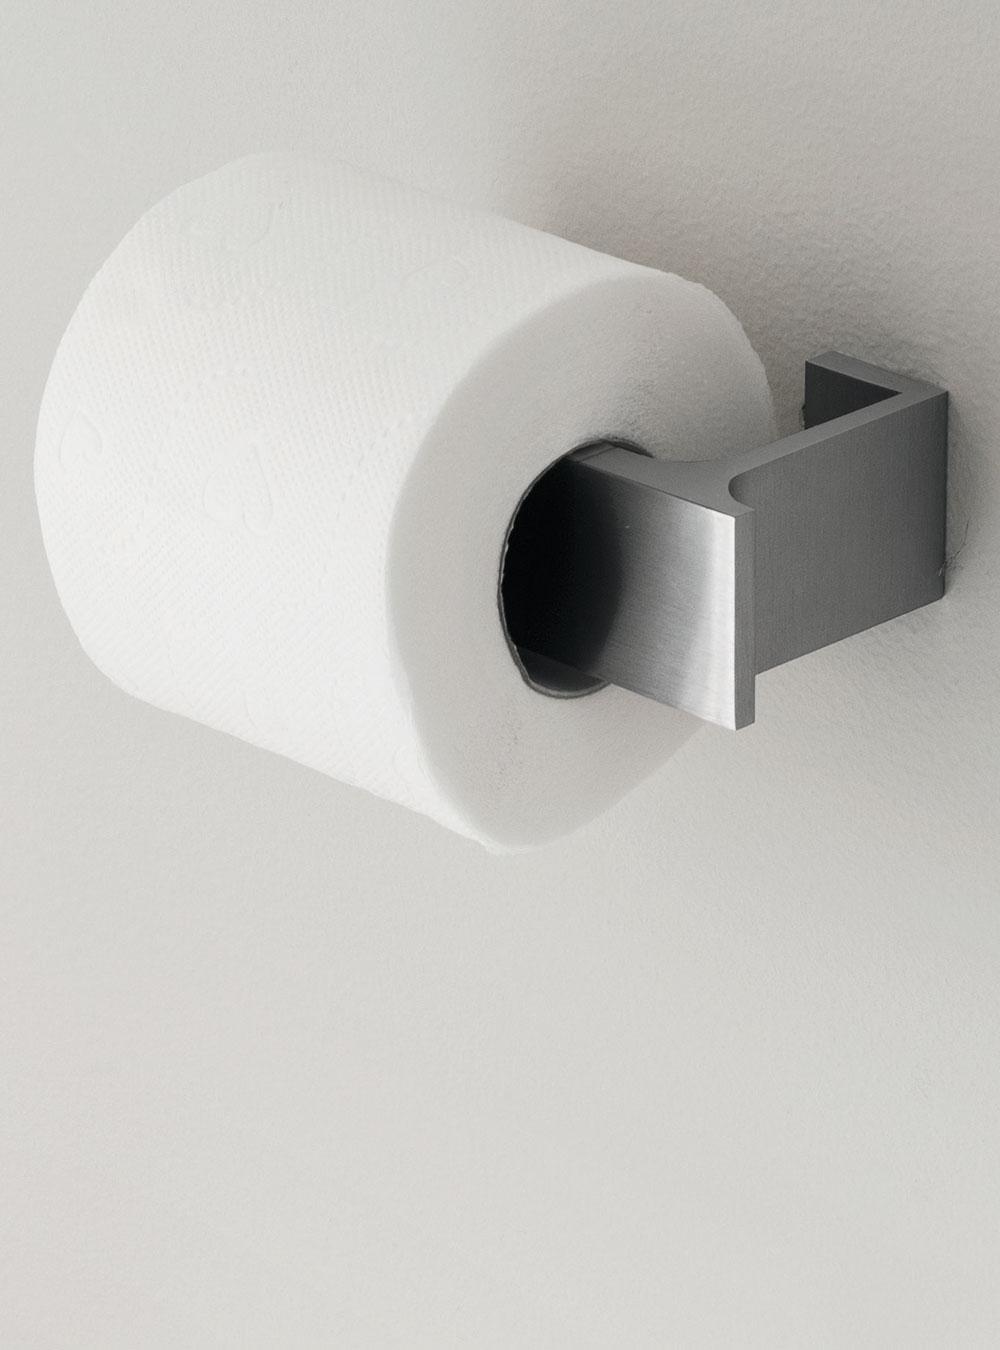 https://www.arbiarredobagno.fr/wp-content/uploads/2021/05/Arbi-Zeus-porta-rotolo-inox-spazzolato-.jpg